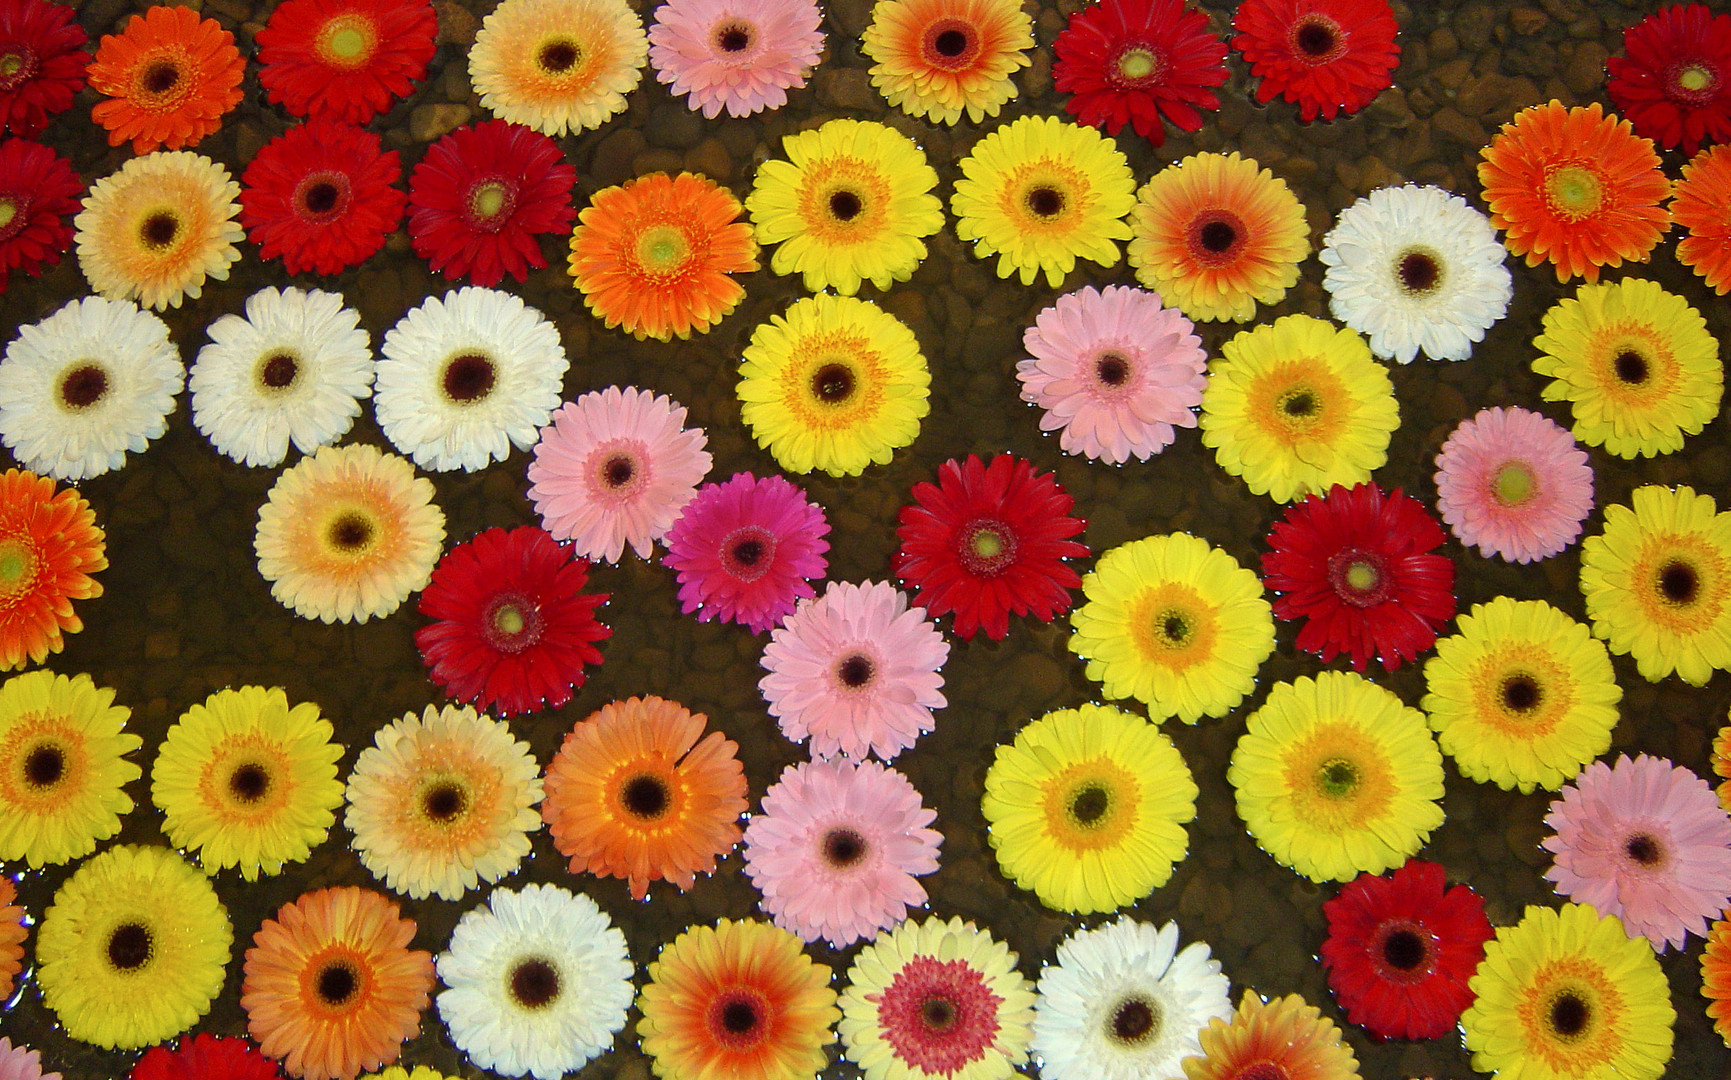 ein gute laune bild foto bild pflanzen pilze flechten bl ten kleinpflanzen. Black Bedroom Furniture Sets. Home Design Ideas